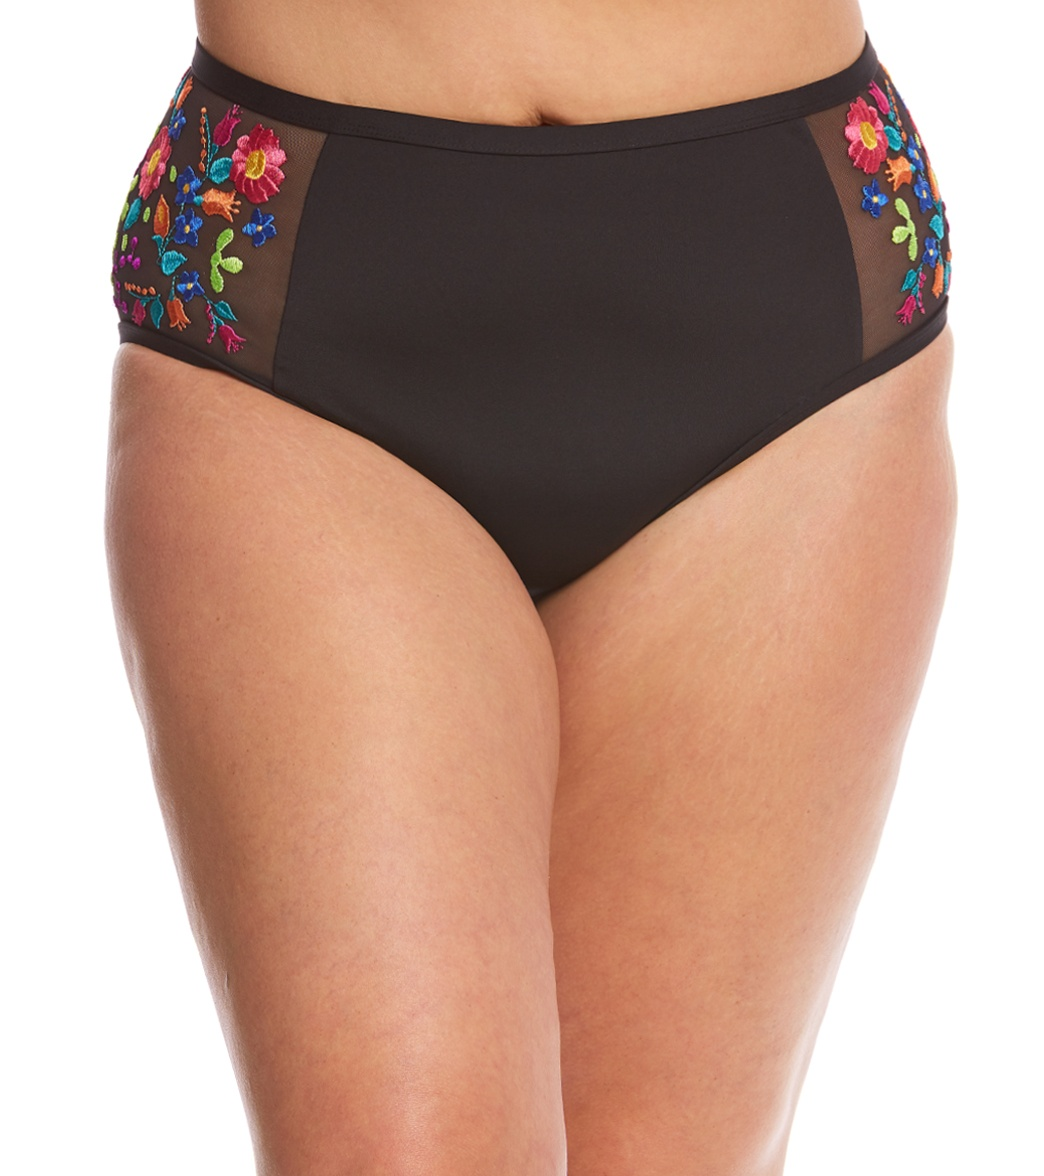 845ca9ae229 ... Kenneth Cole Reaction Plus Size Garden Groove High Waist Bikini Bottom.  MODEL MEASUREMENTS